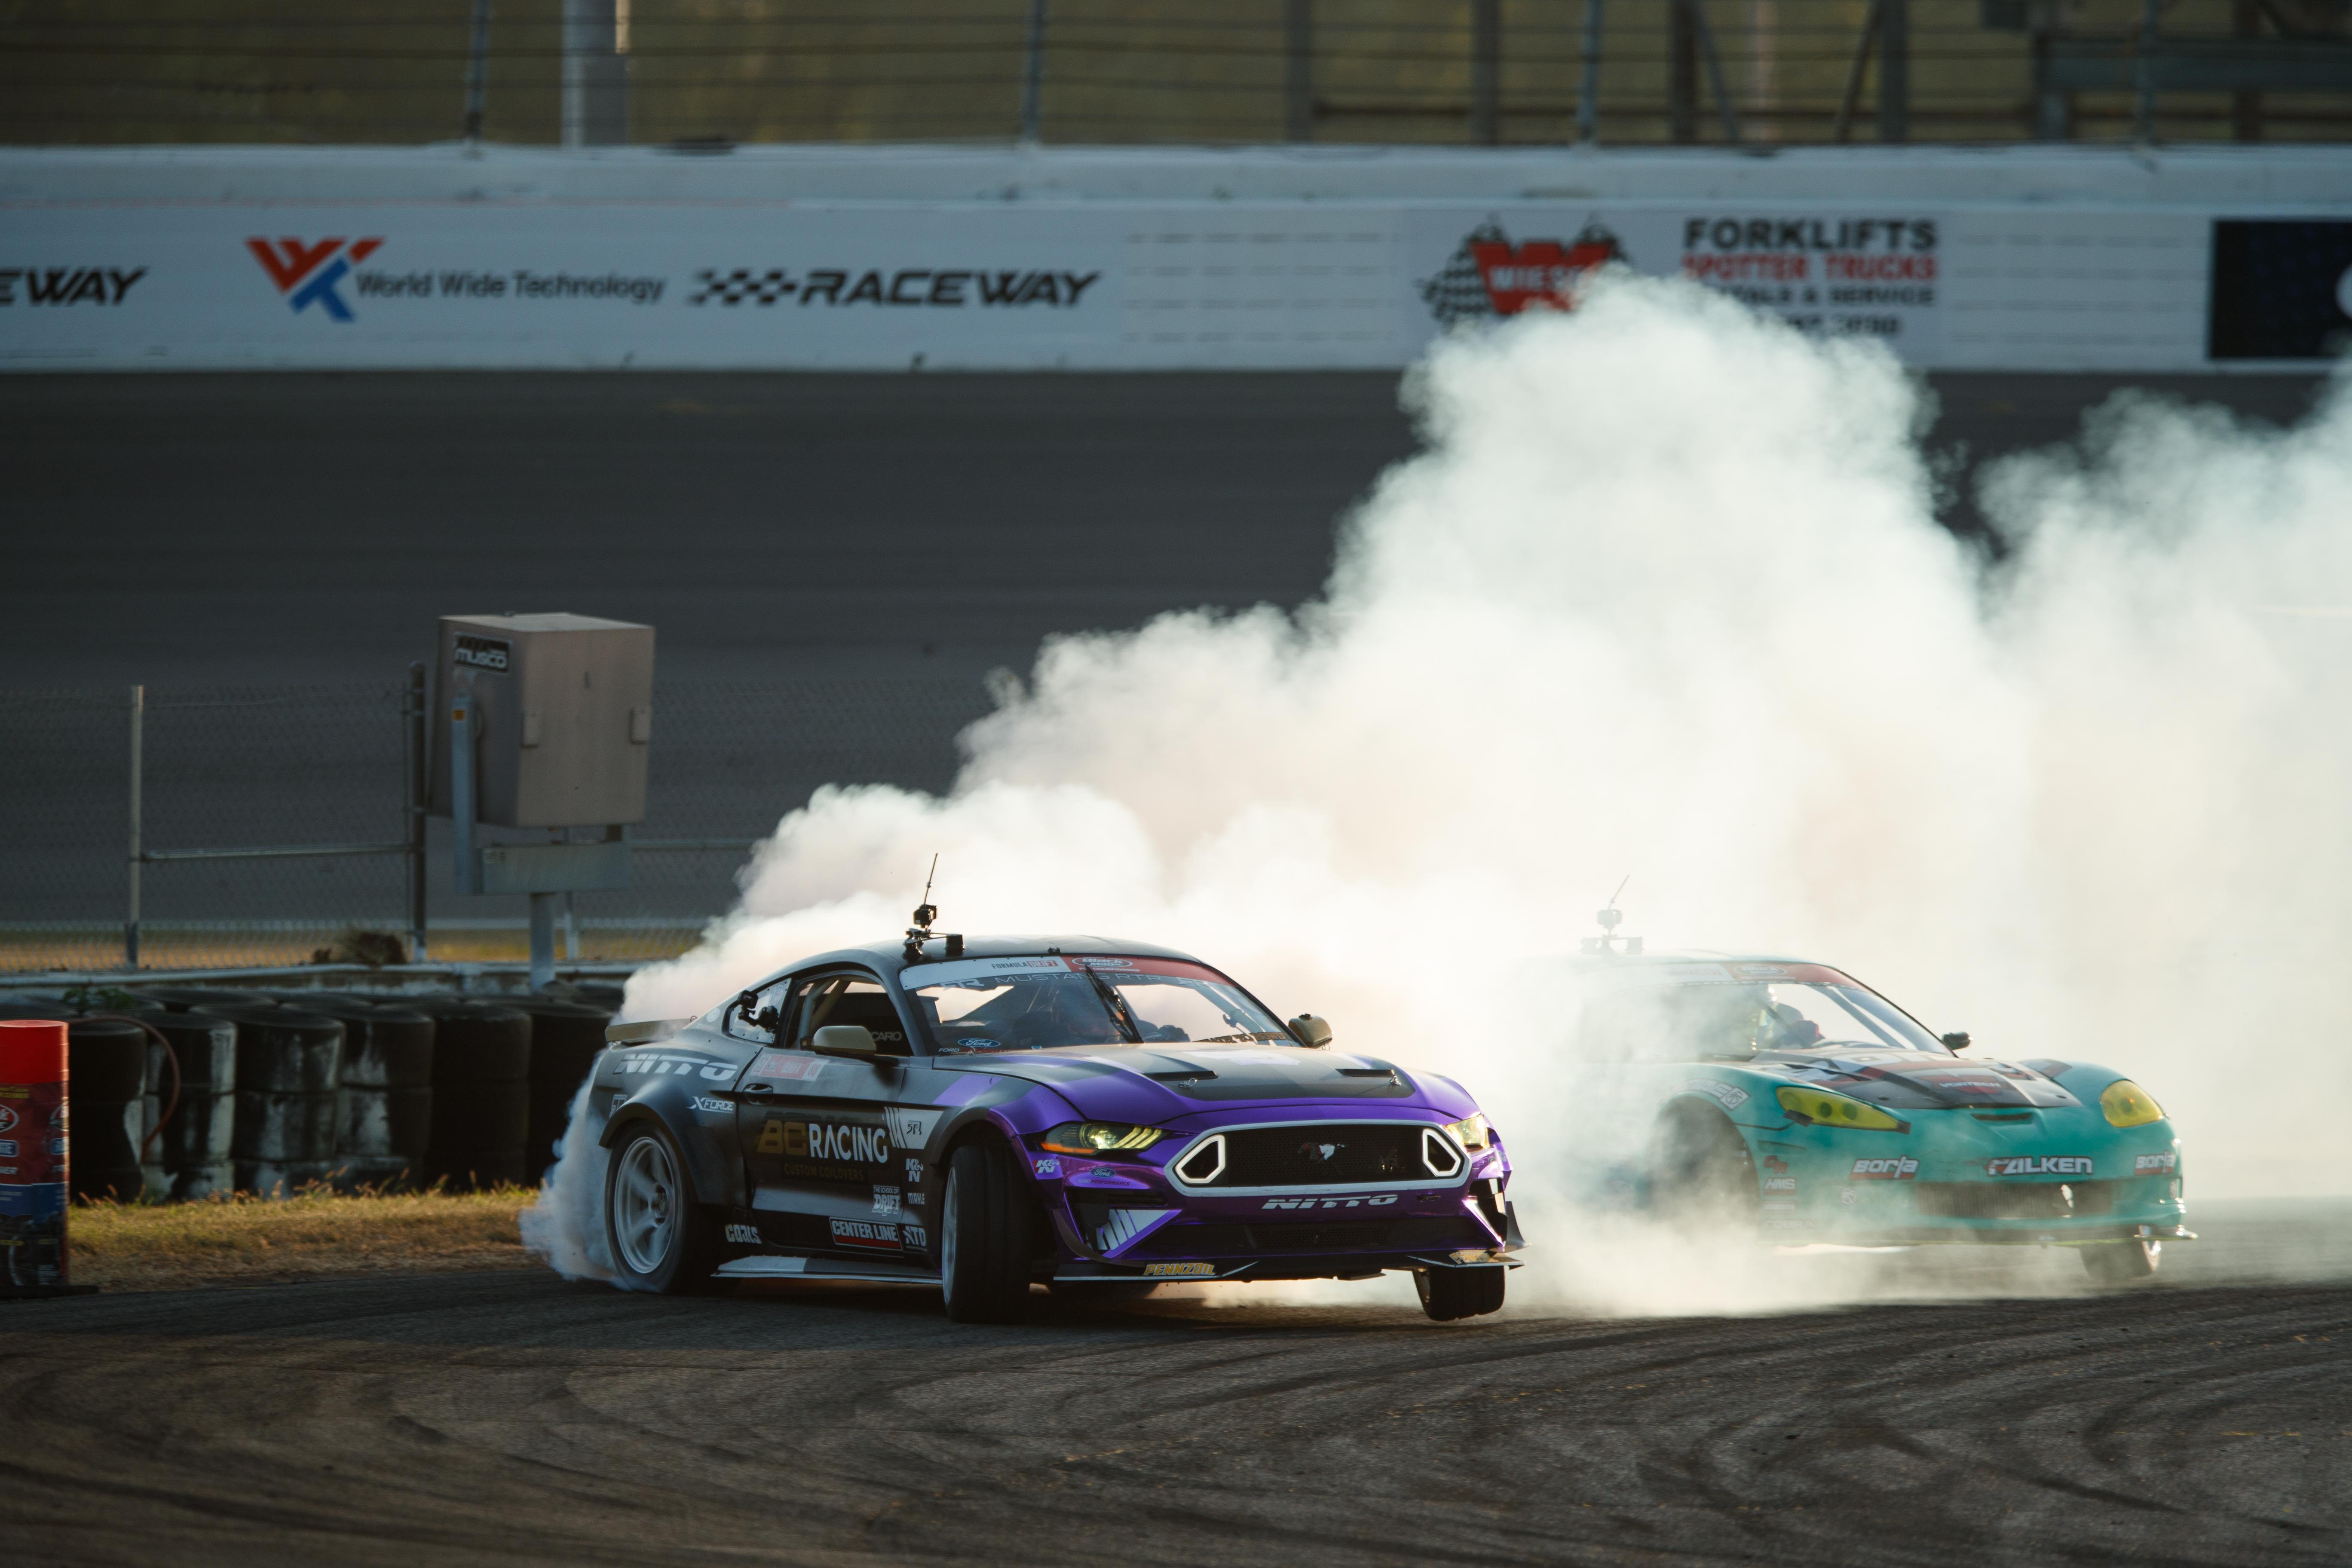 bc-racing-chelsea-denofa-gallery_5860